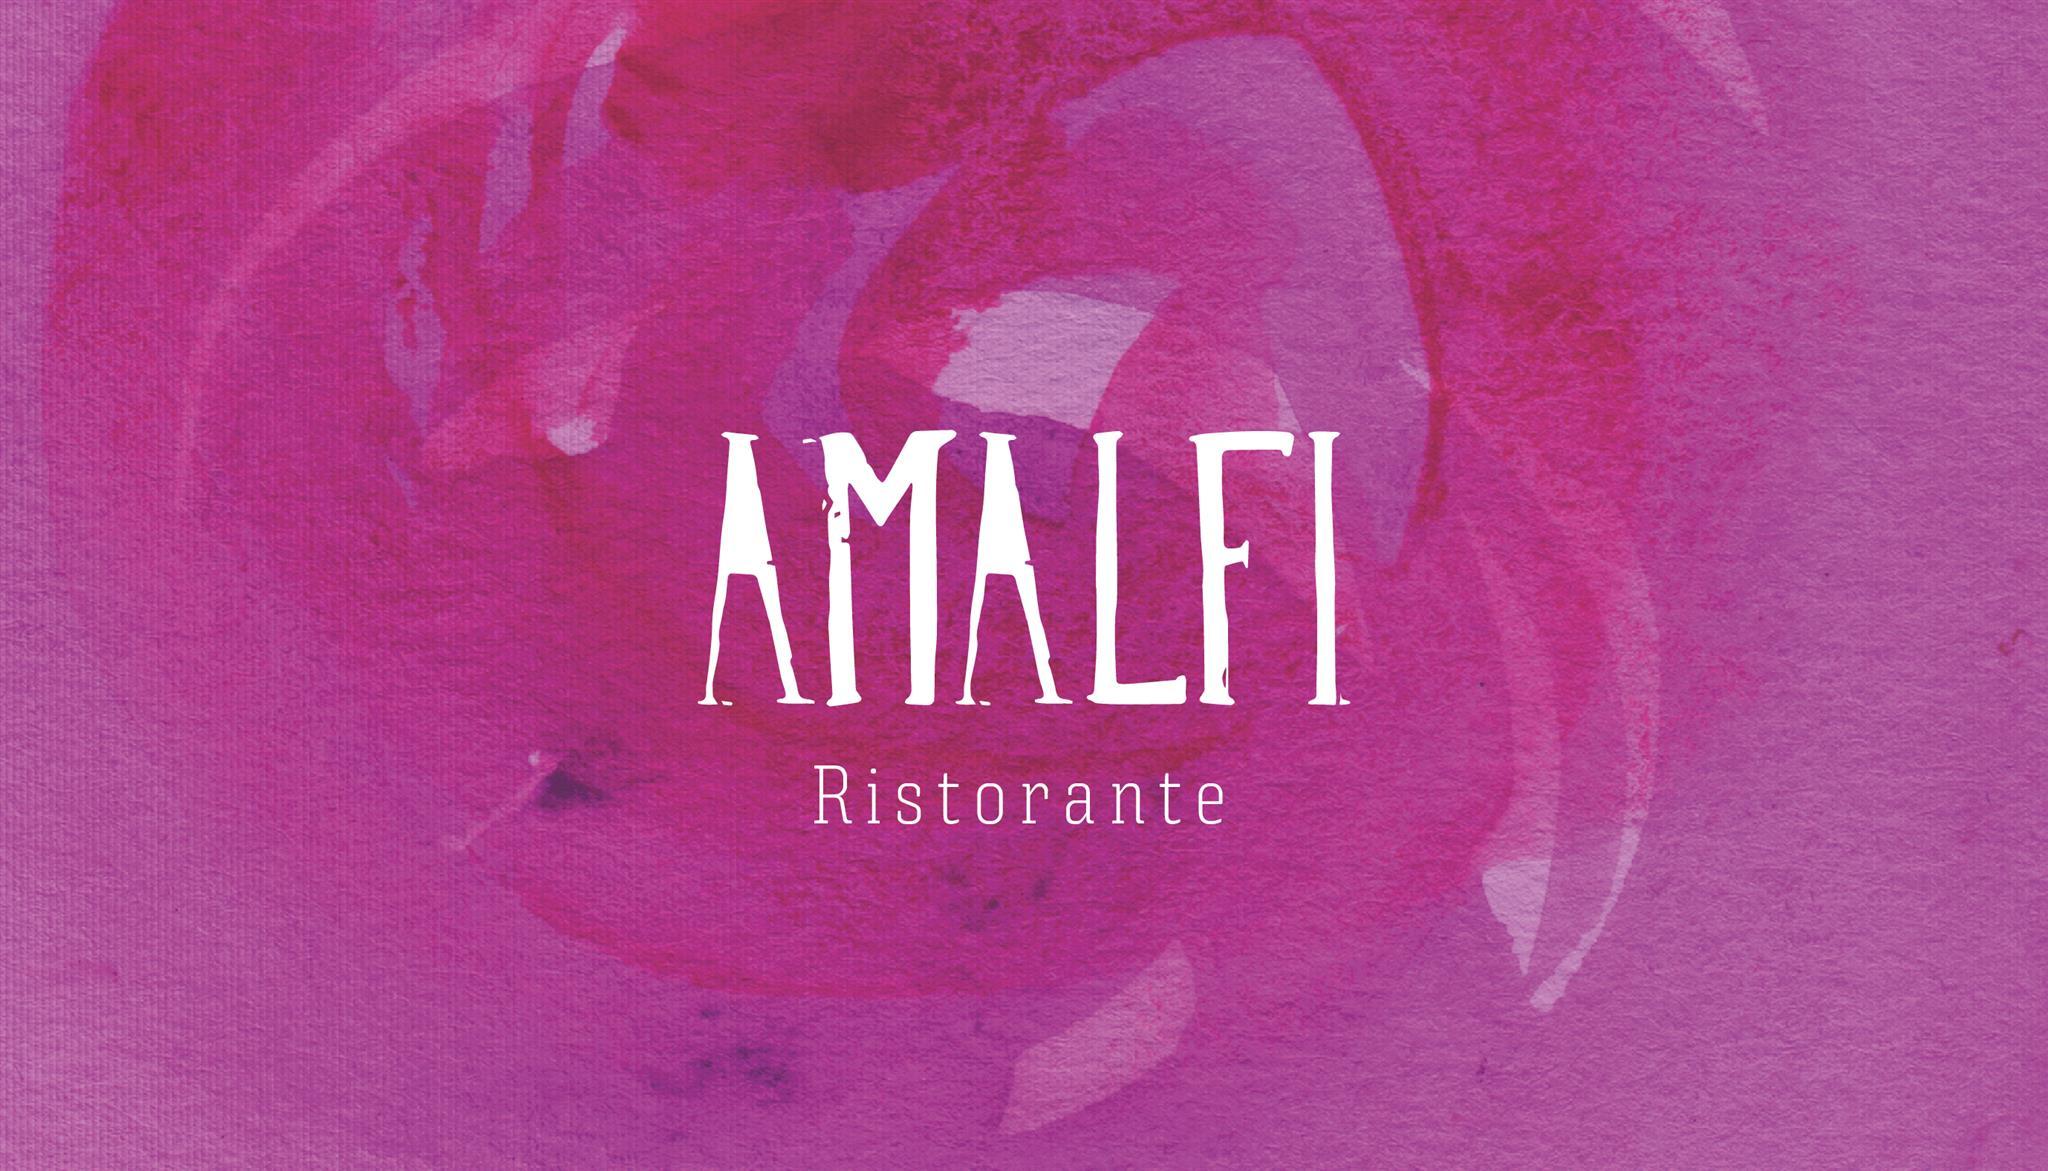 Campanha branding Amalfi Ristorante